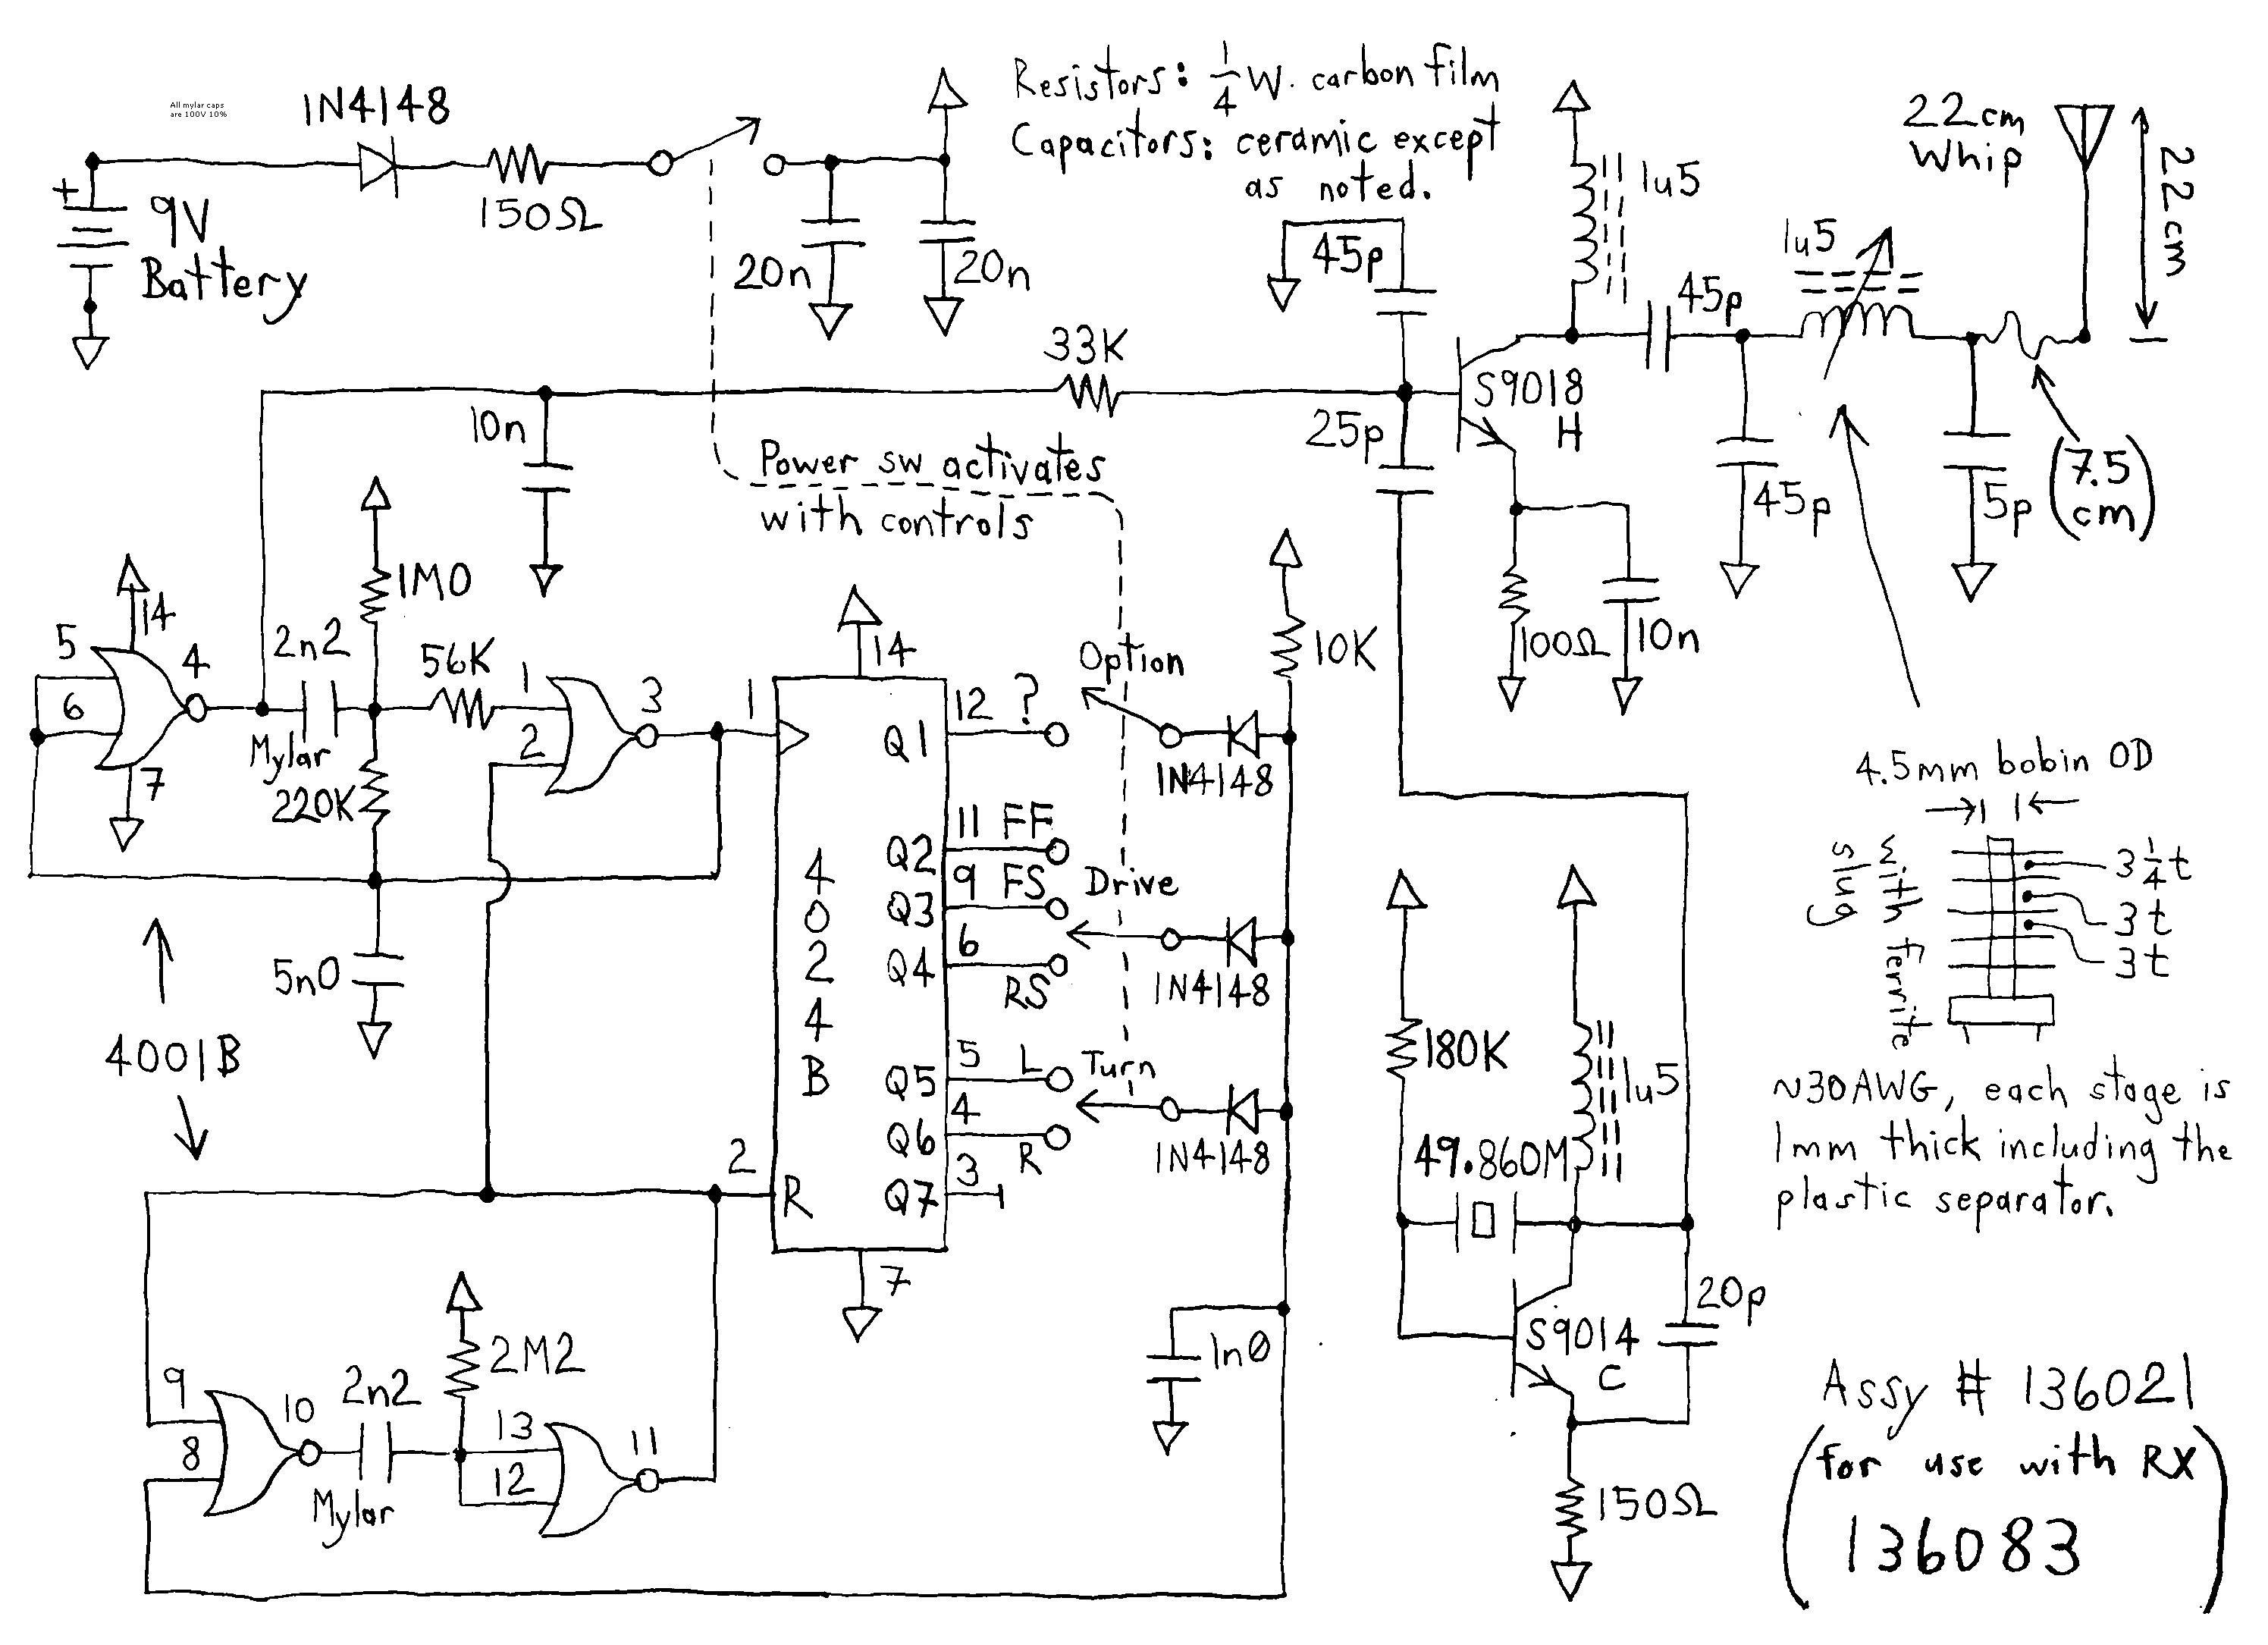 98 ford Explorer Engine Diagram ford Explorer Relay Diagram – Simple Wiring Diagram Of 98 ford Explorer Engine Diagram